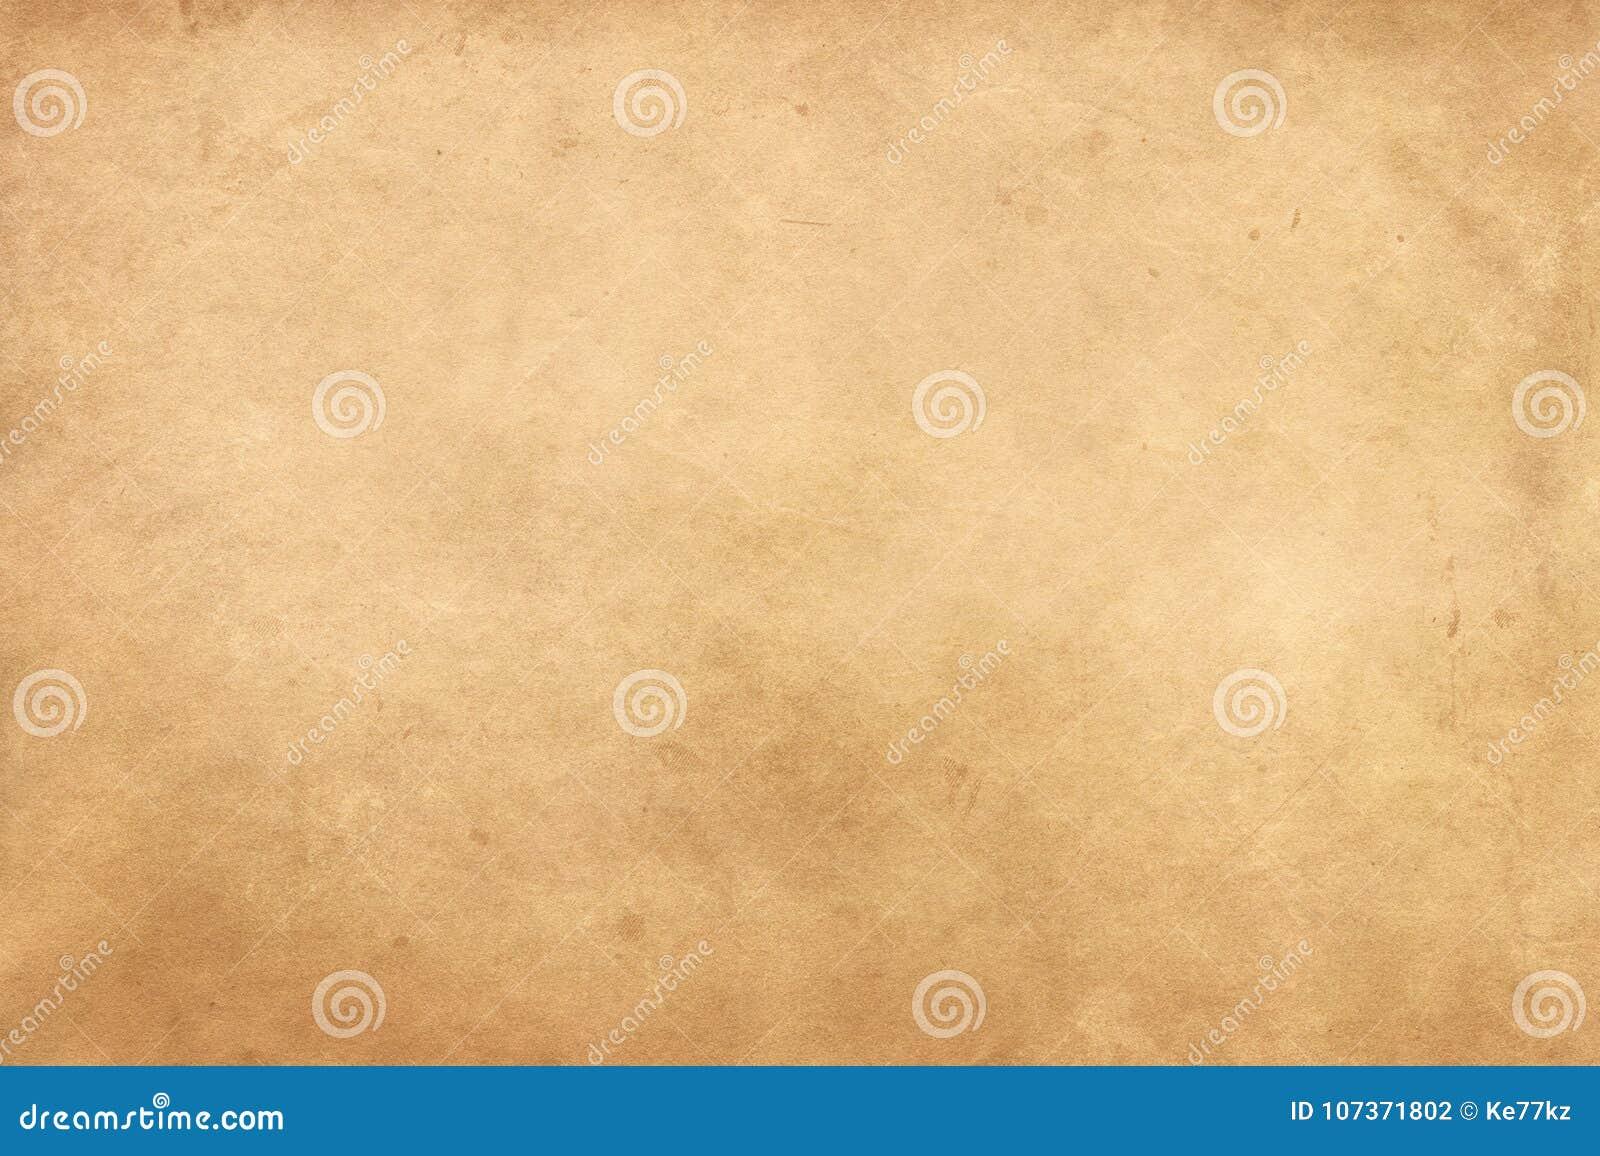 Vieille texture de papier